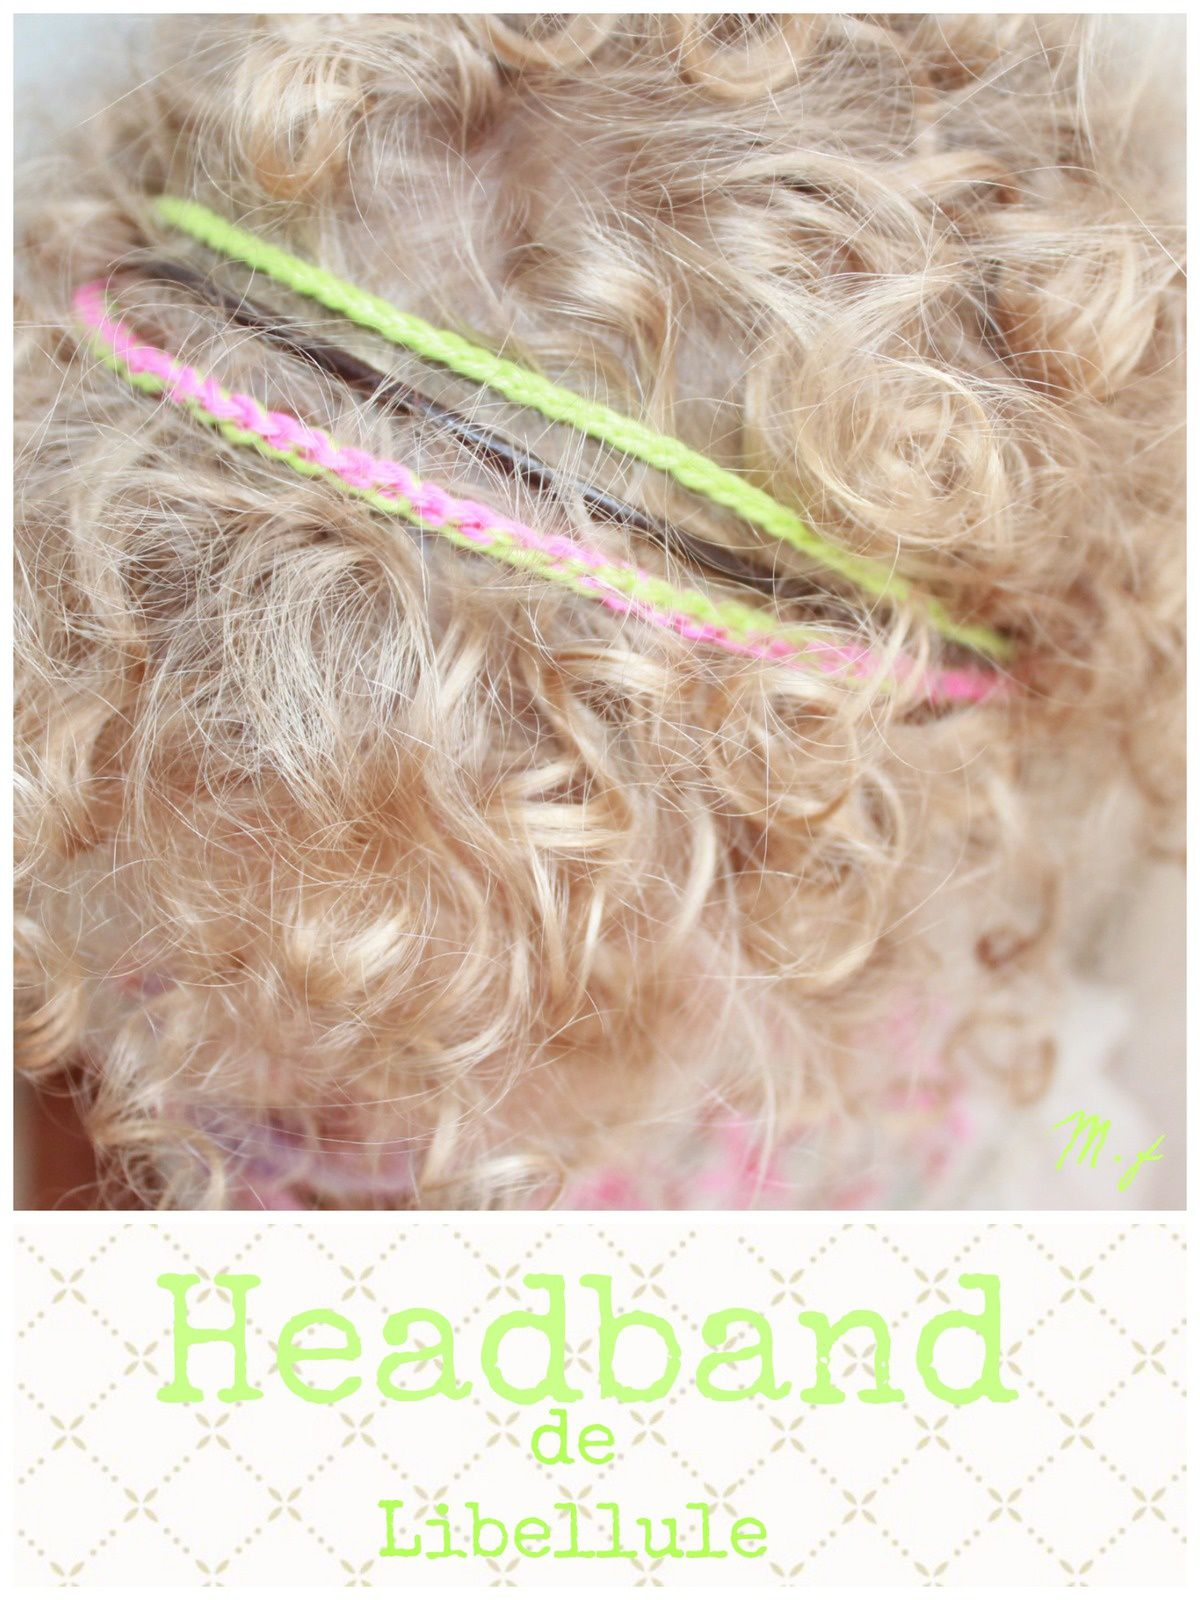 SC n°231...du fluo... un Headband de mini coquette ,bracelet &amp&#x3B; plein de merci